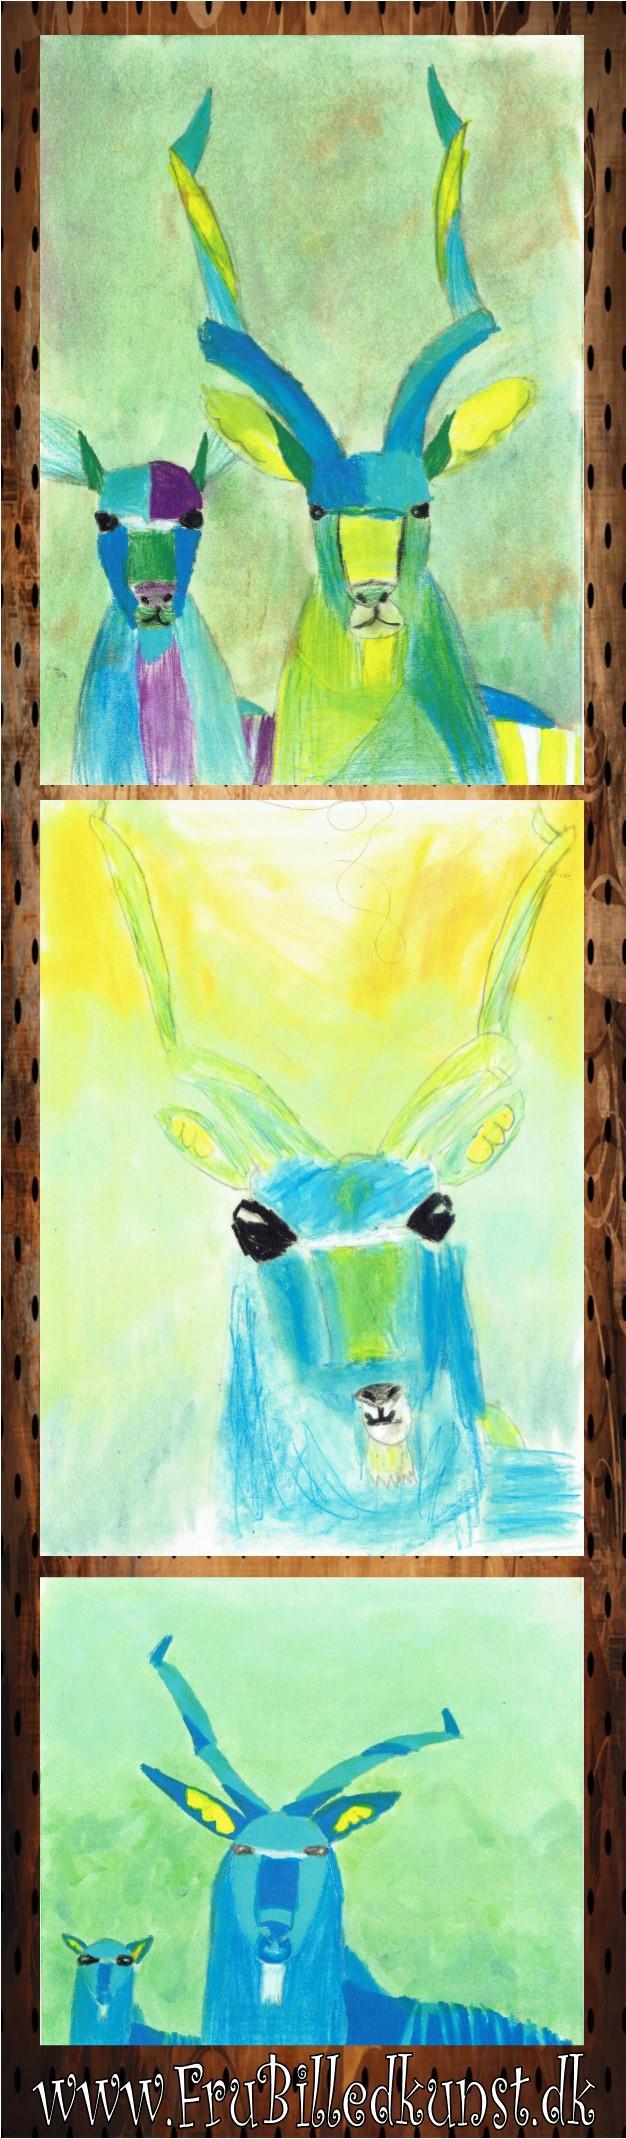 www.FruBilledkunst.dk - antiloper kudu